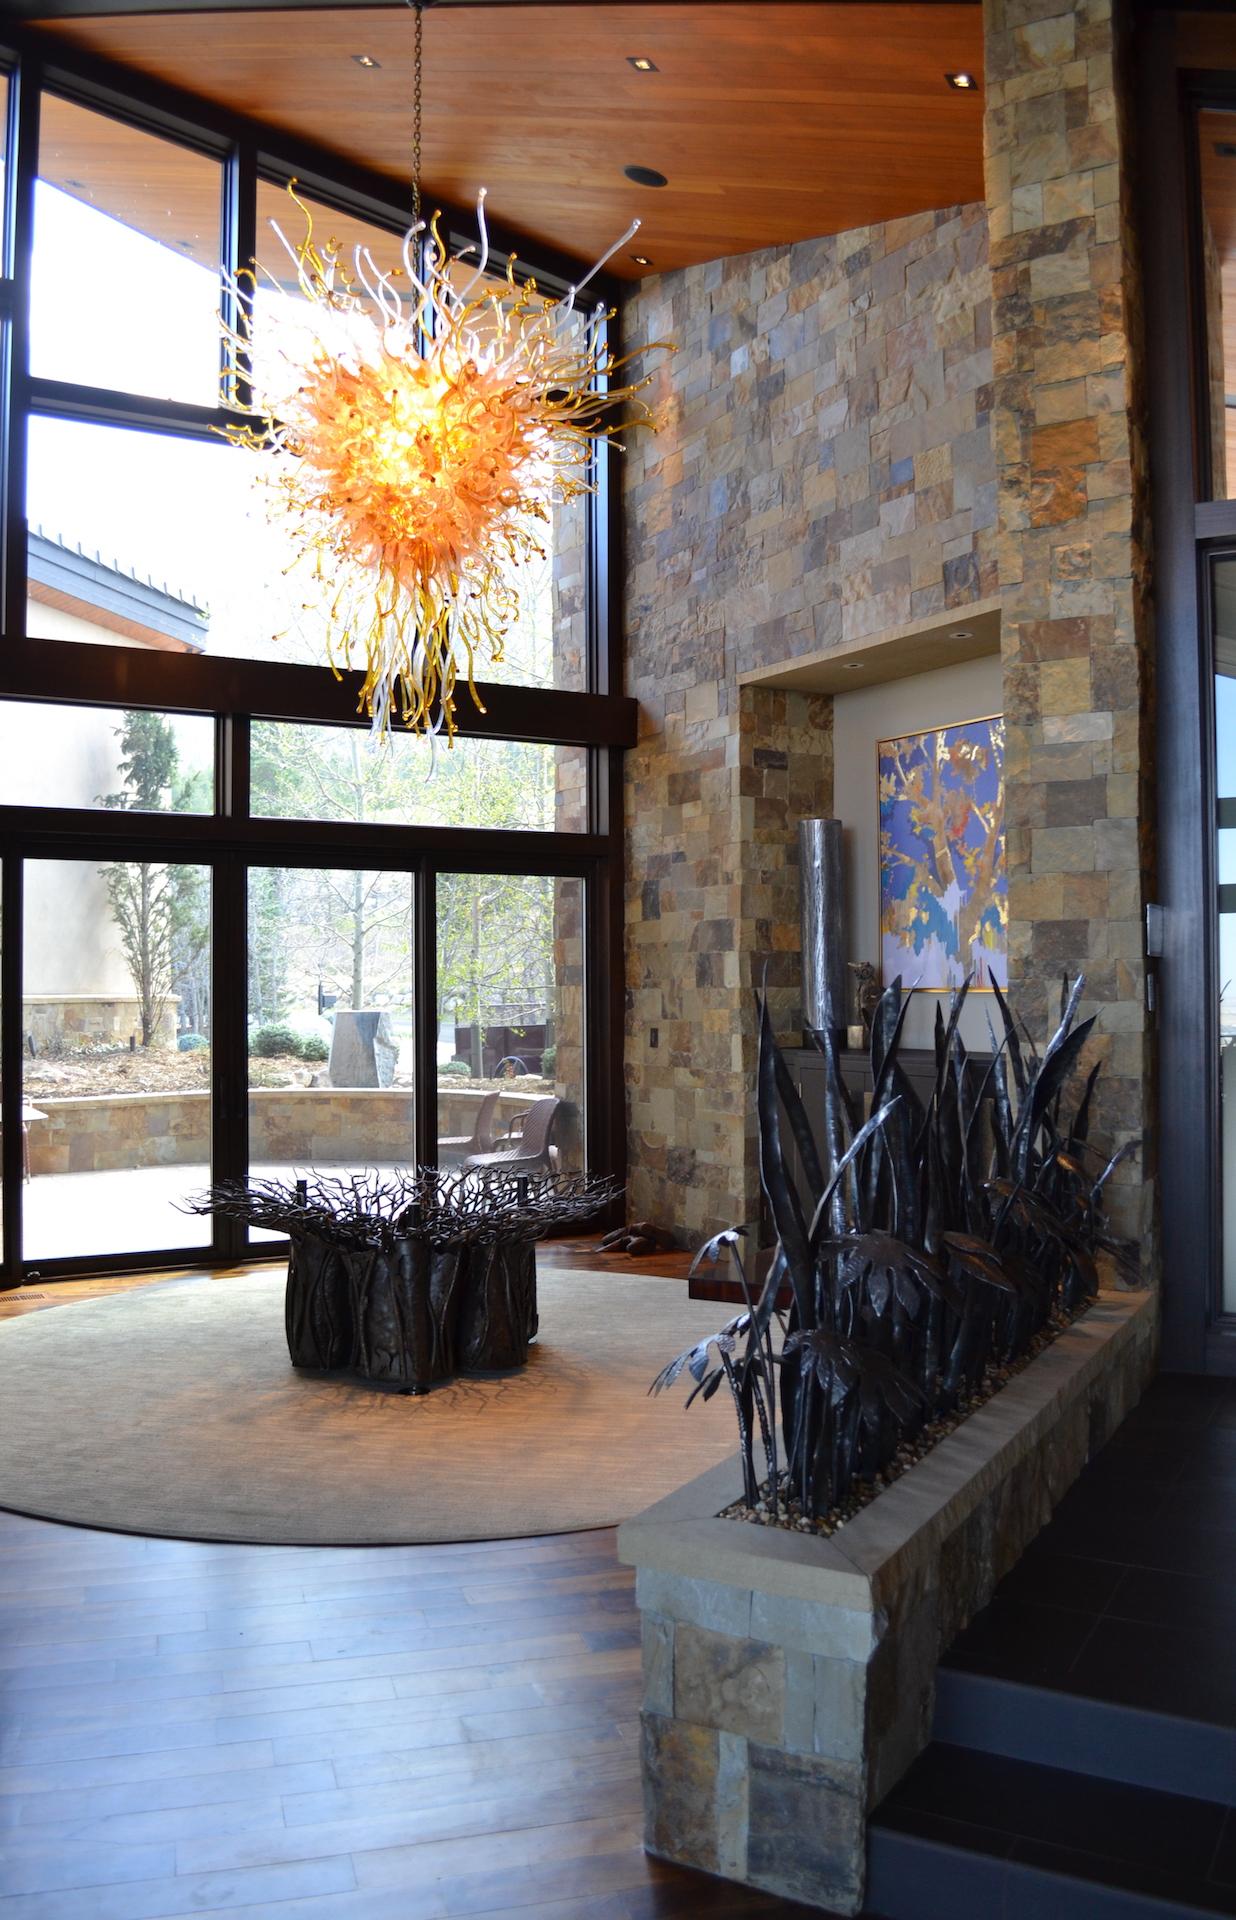 NEST ELM TREE TABLE + SANSAVARIA AND FERN SCULPTURE + CABINET HANDLES